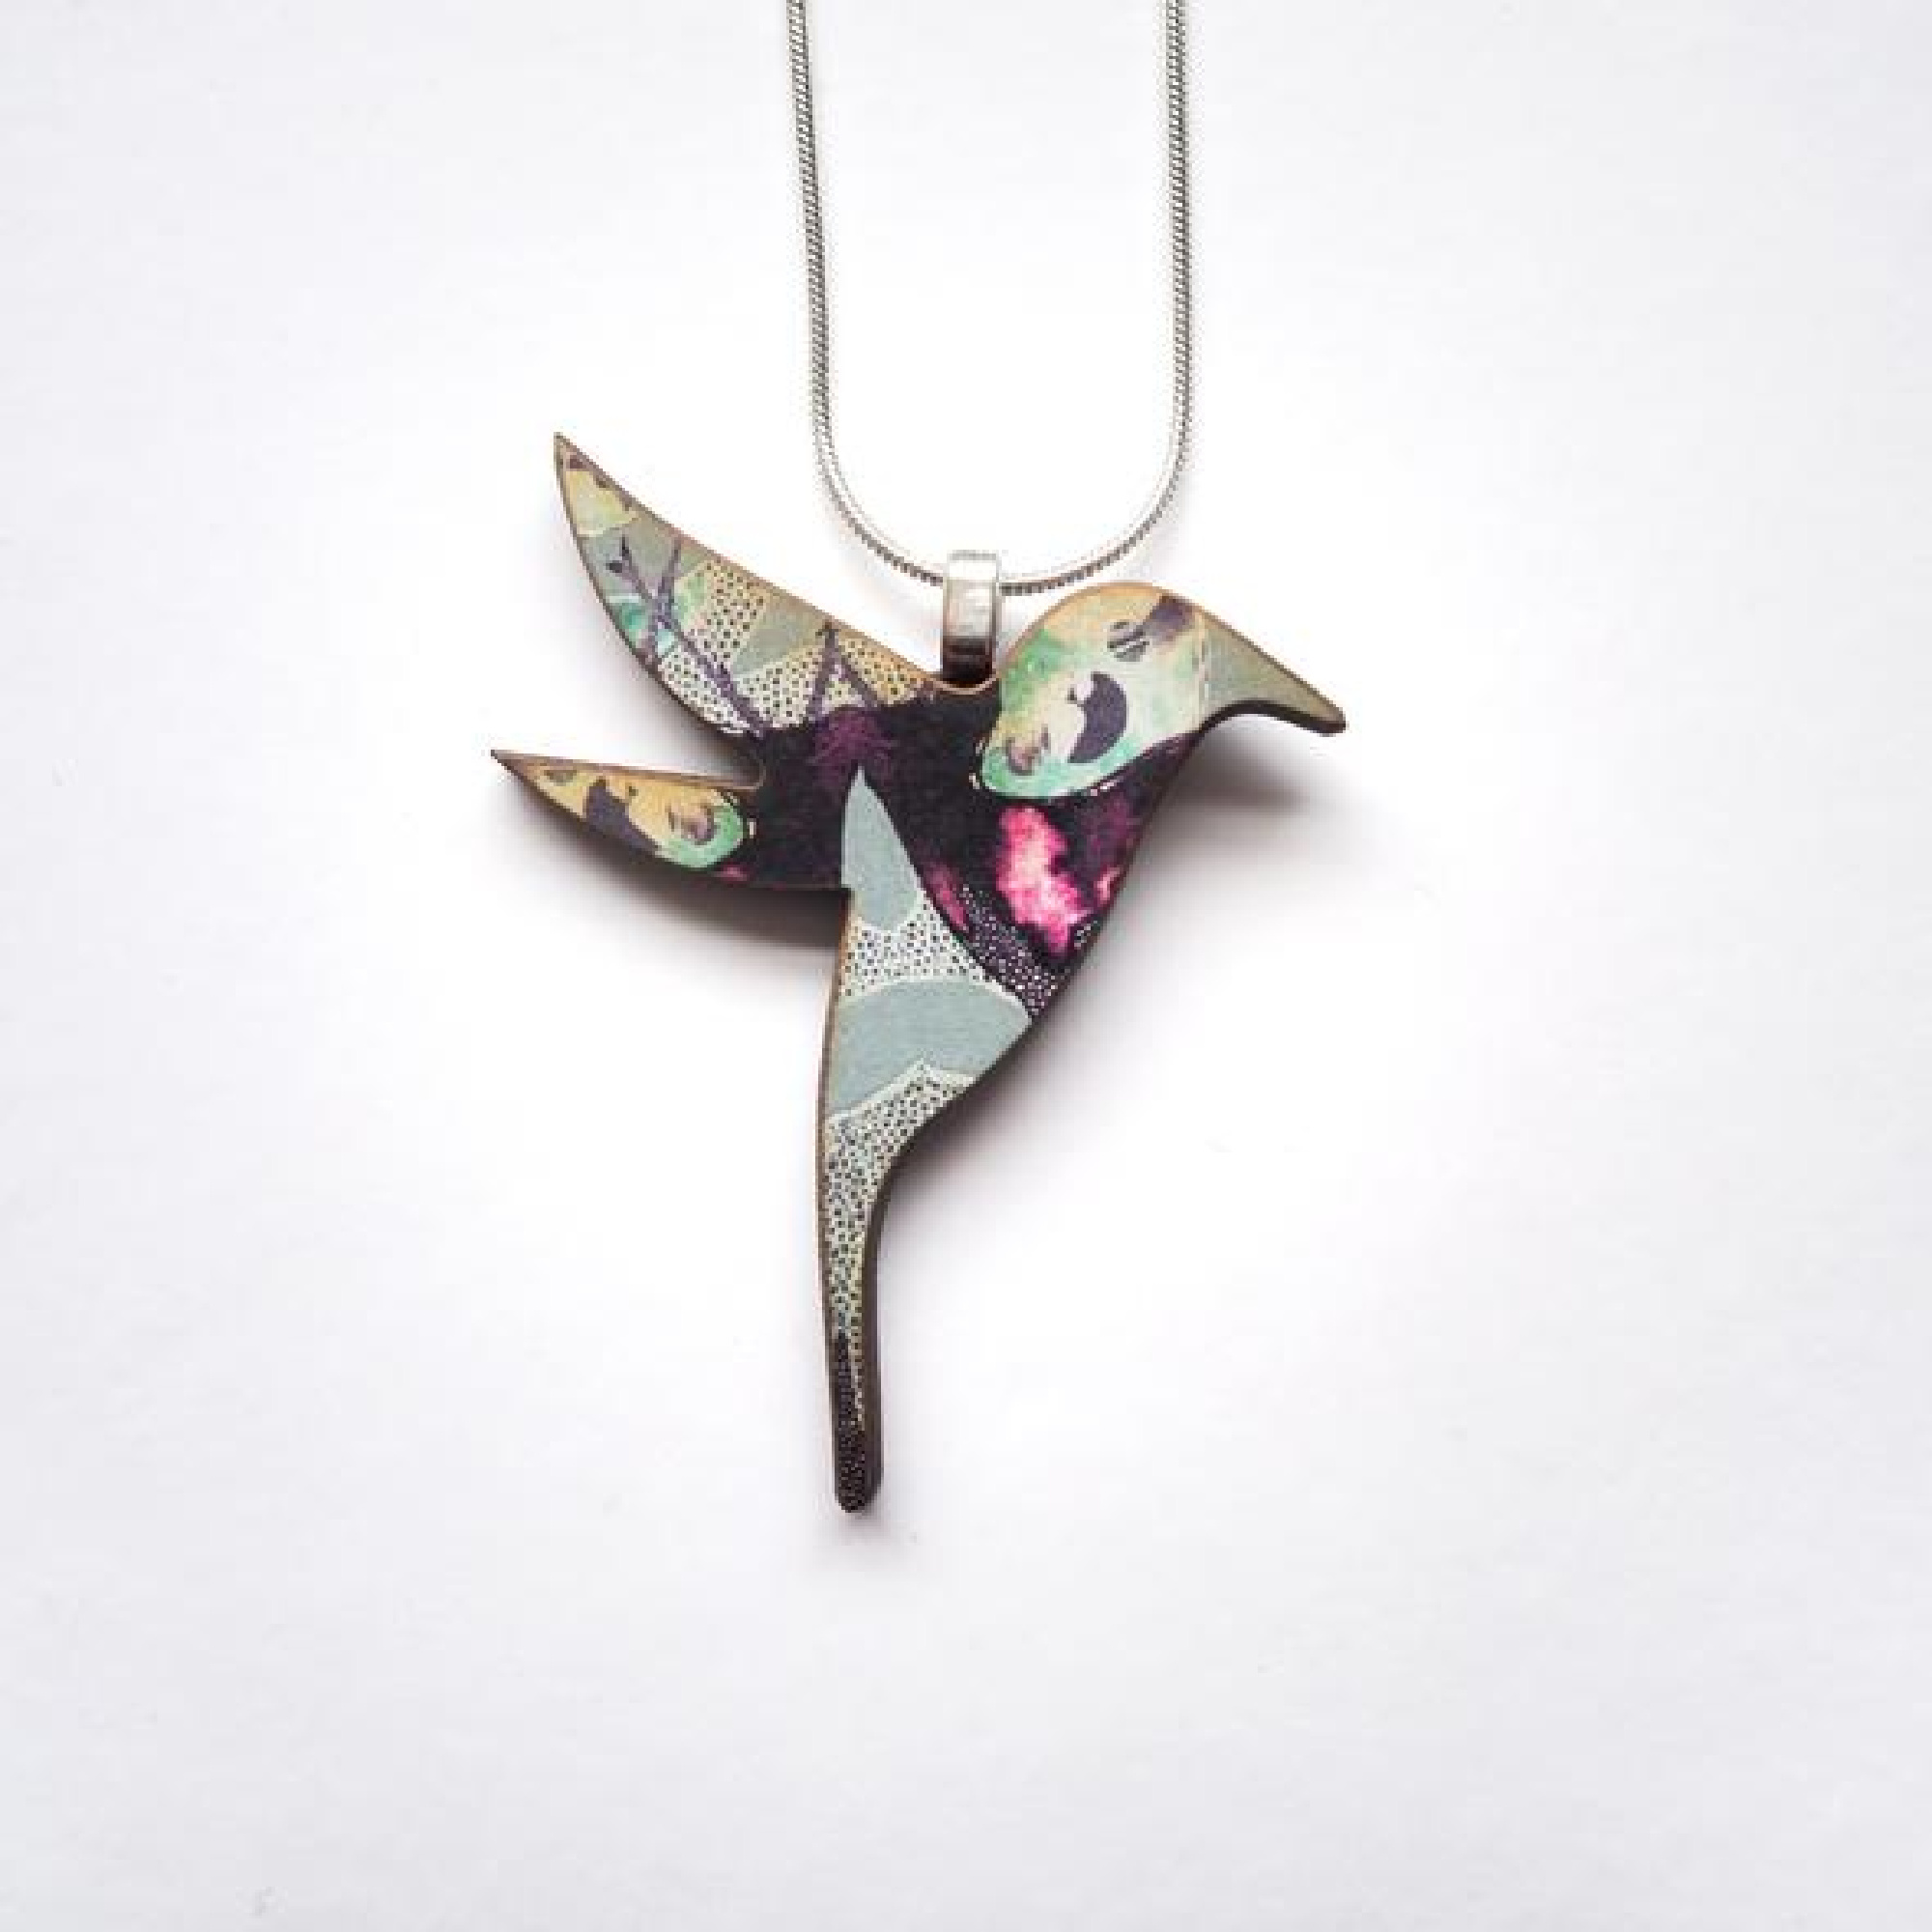 Hummingbird Necklace by Mica Peet